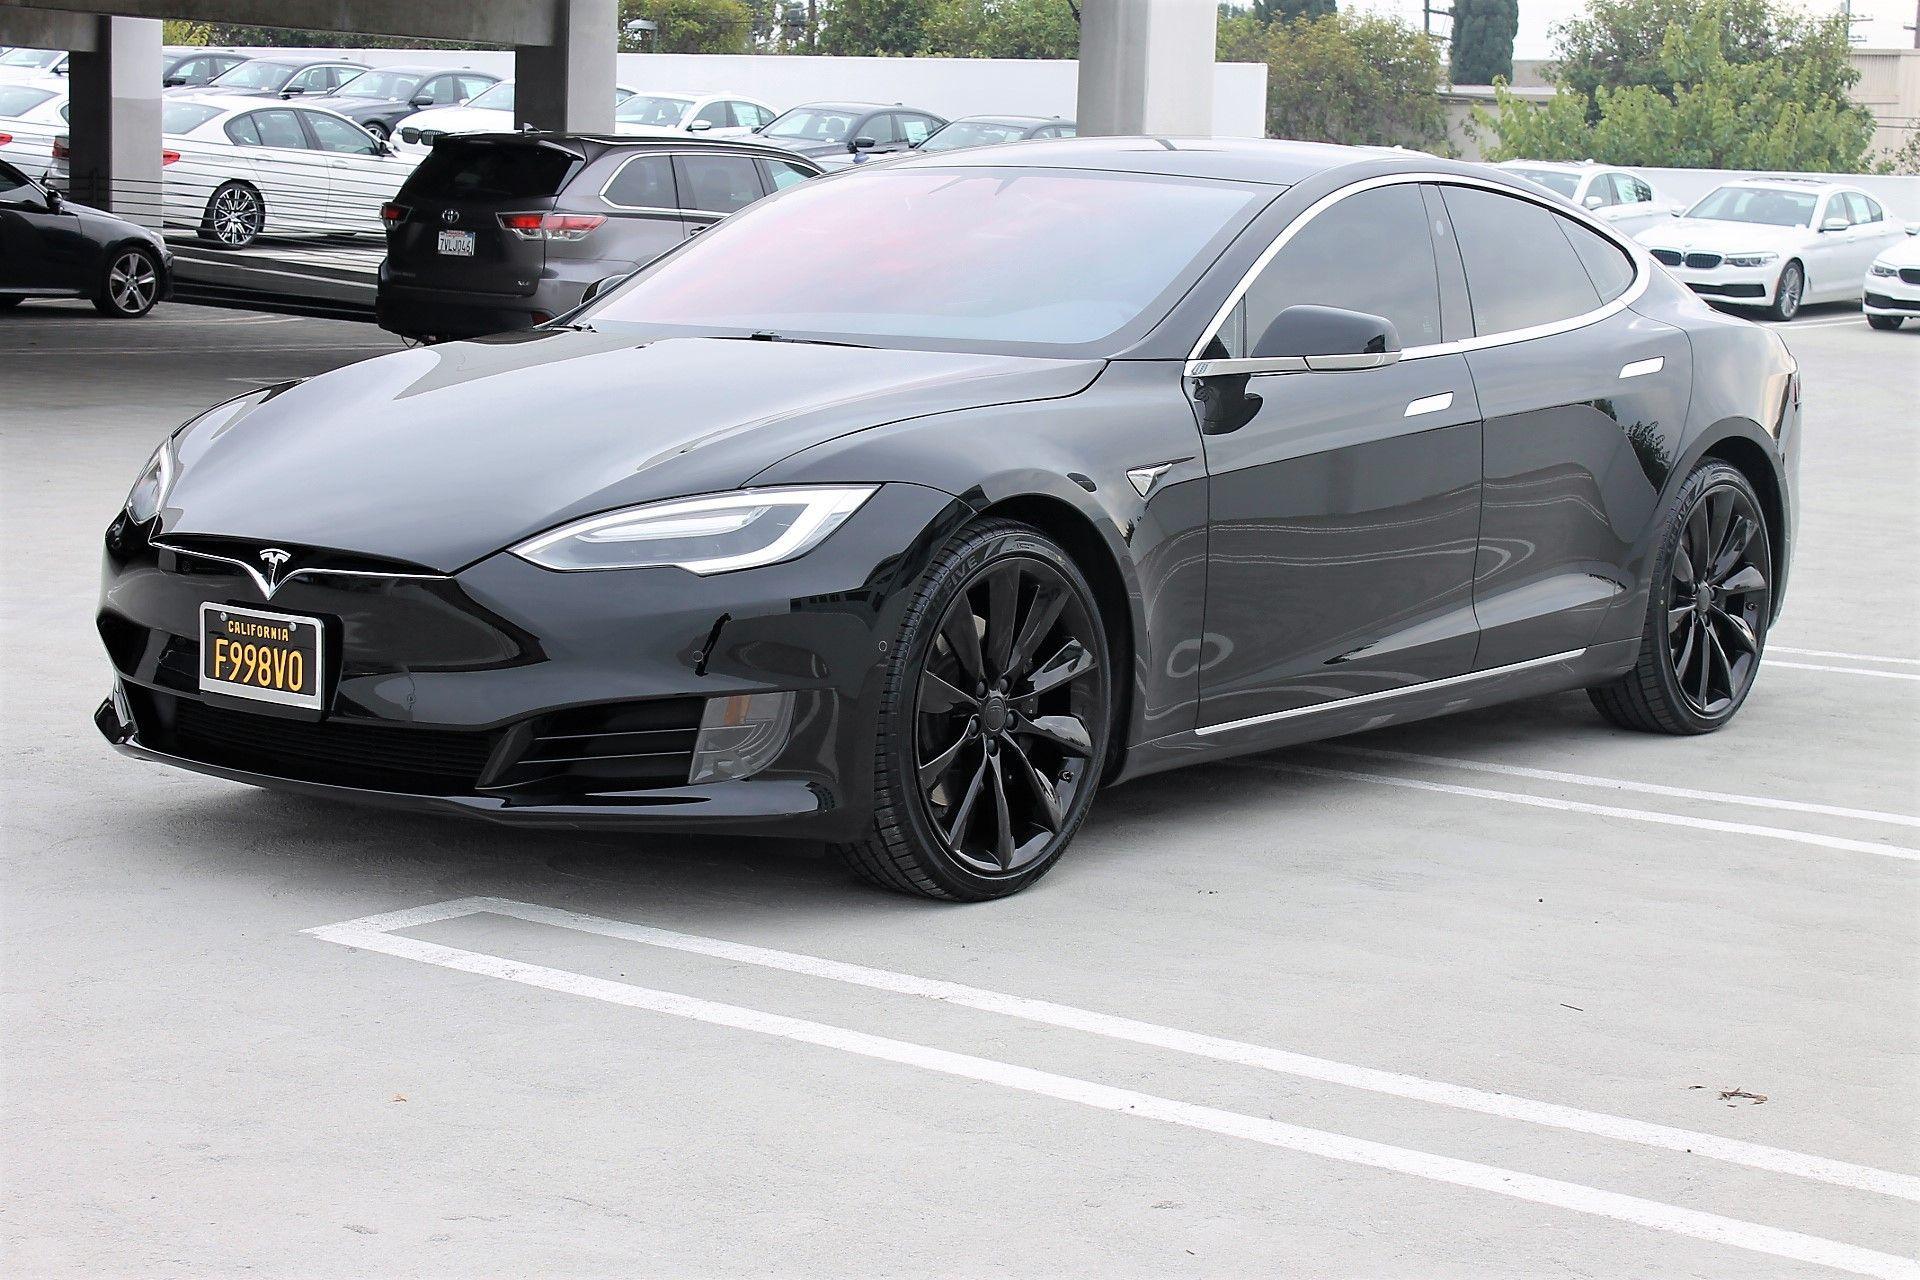 2016 Used Tesla Model S 75 Costa Mesa California Active 2 0 Autopilot W Autosteer Eligible For Red Ca Hov Carpool Decal Tesla Model S Black Wheels Model